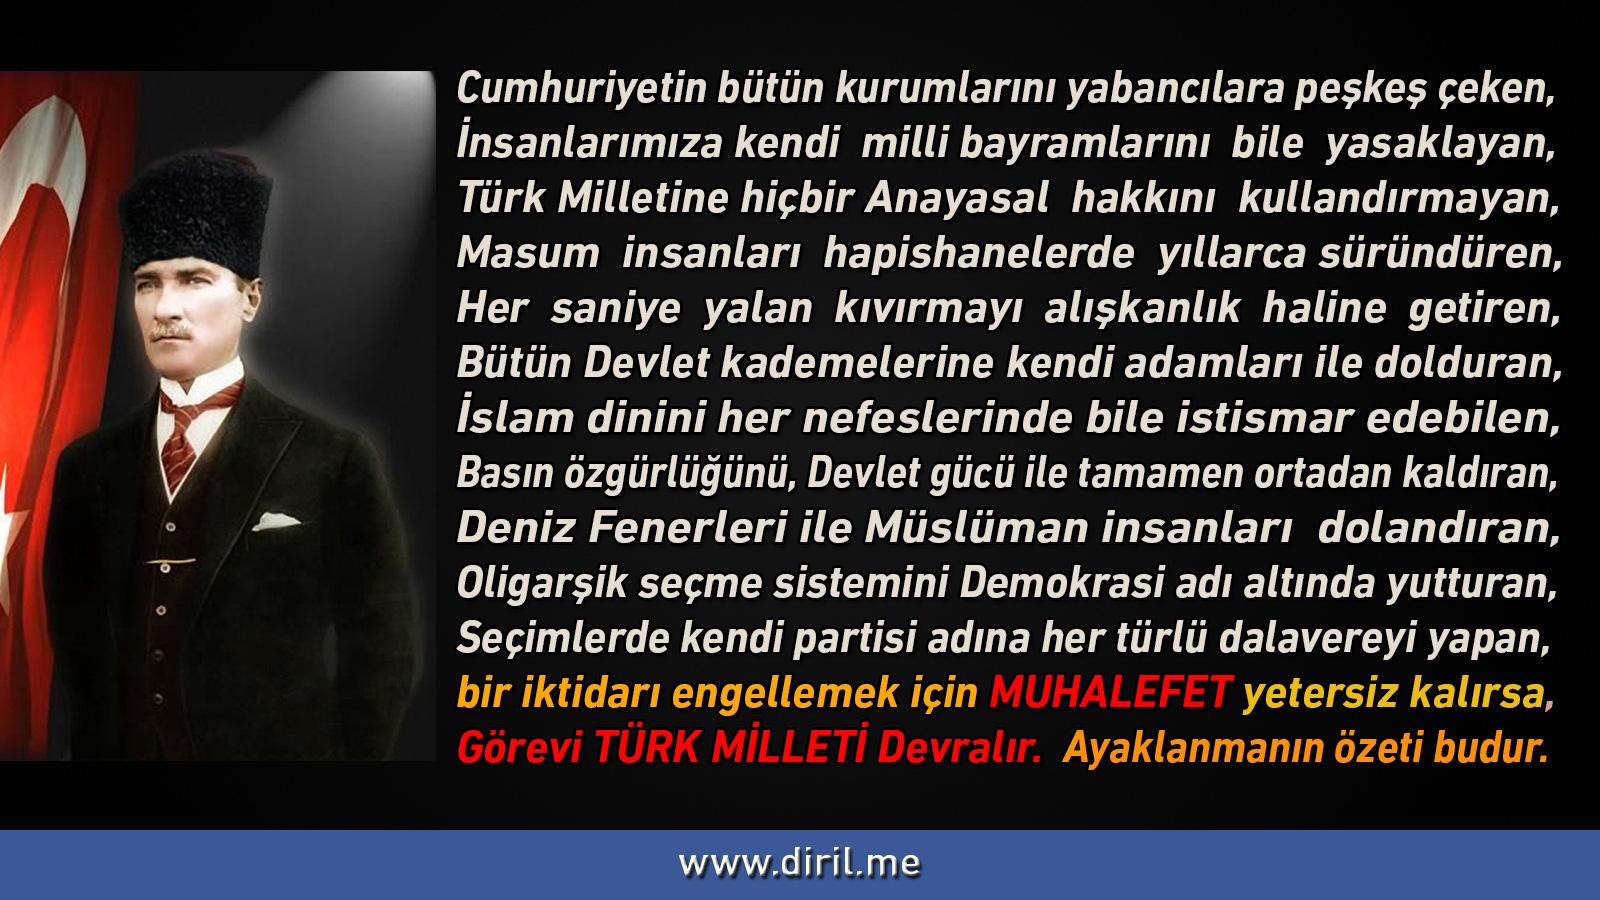 2013-06-04_TürkMilletiDevralır_1600x900